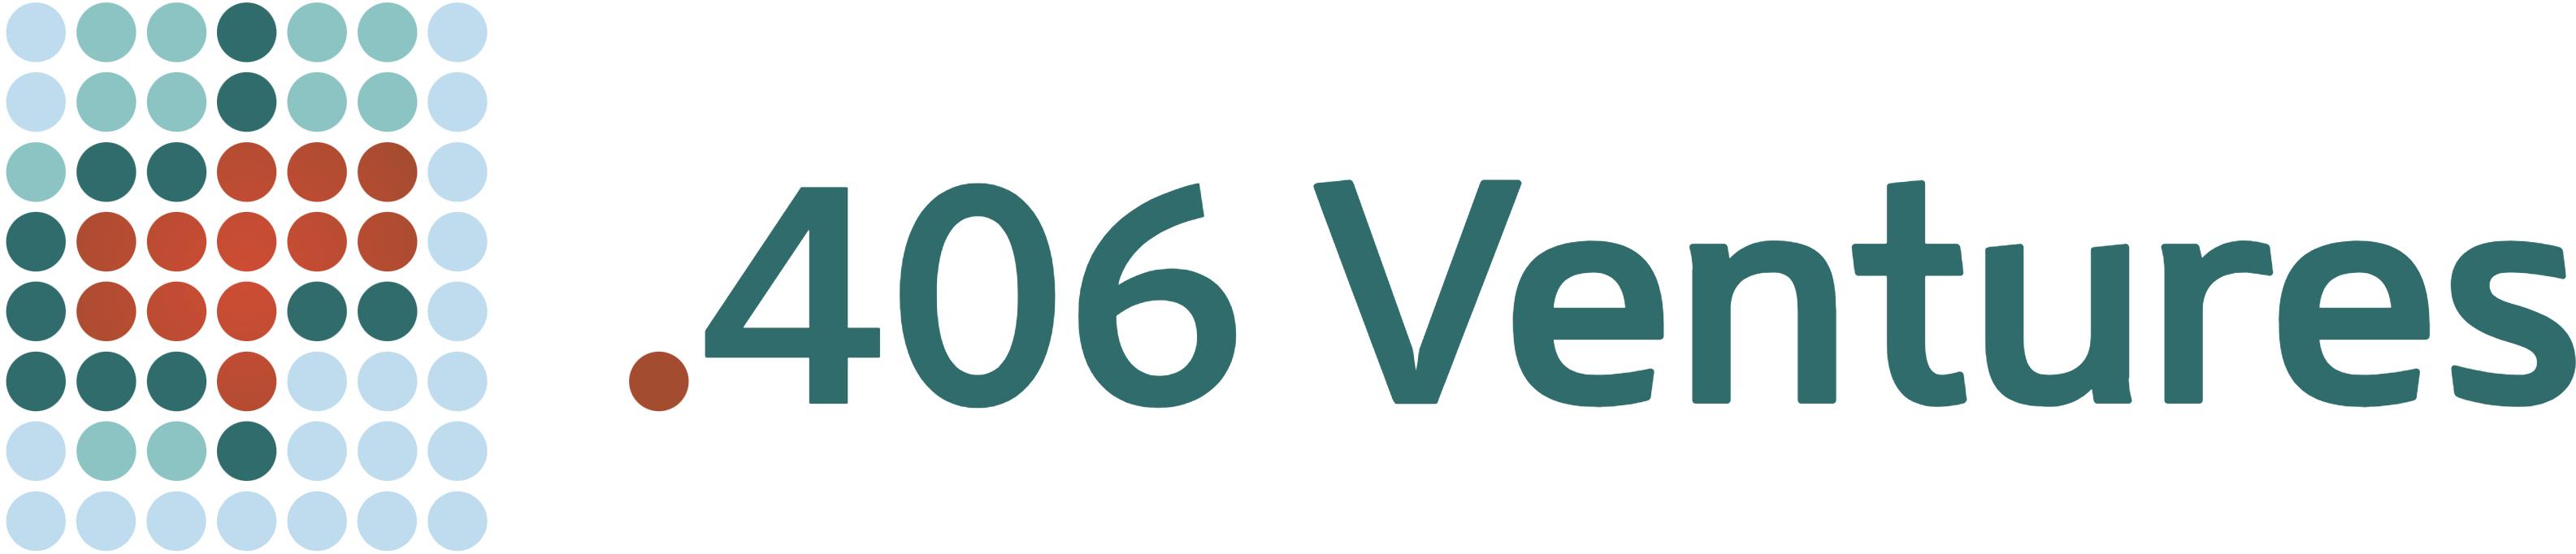 406 ventures logo